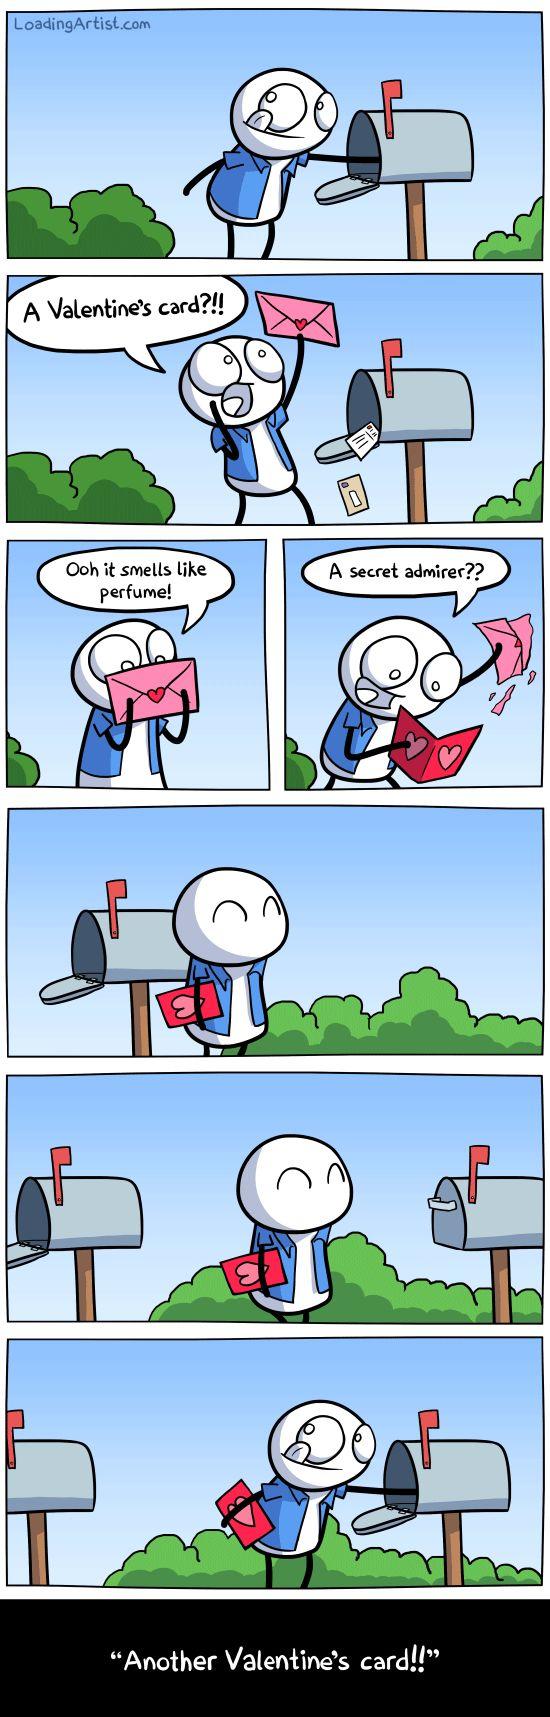 Happy Valentines Day! - Imgur